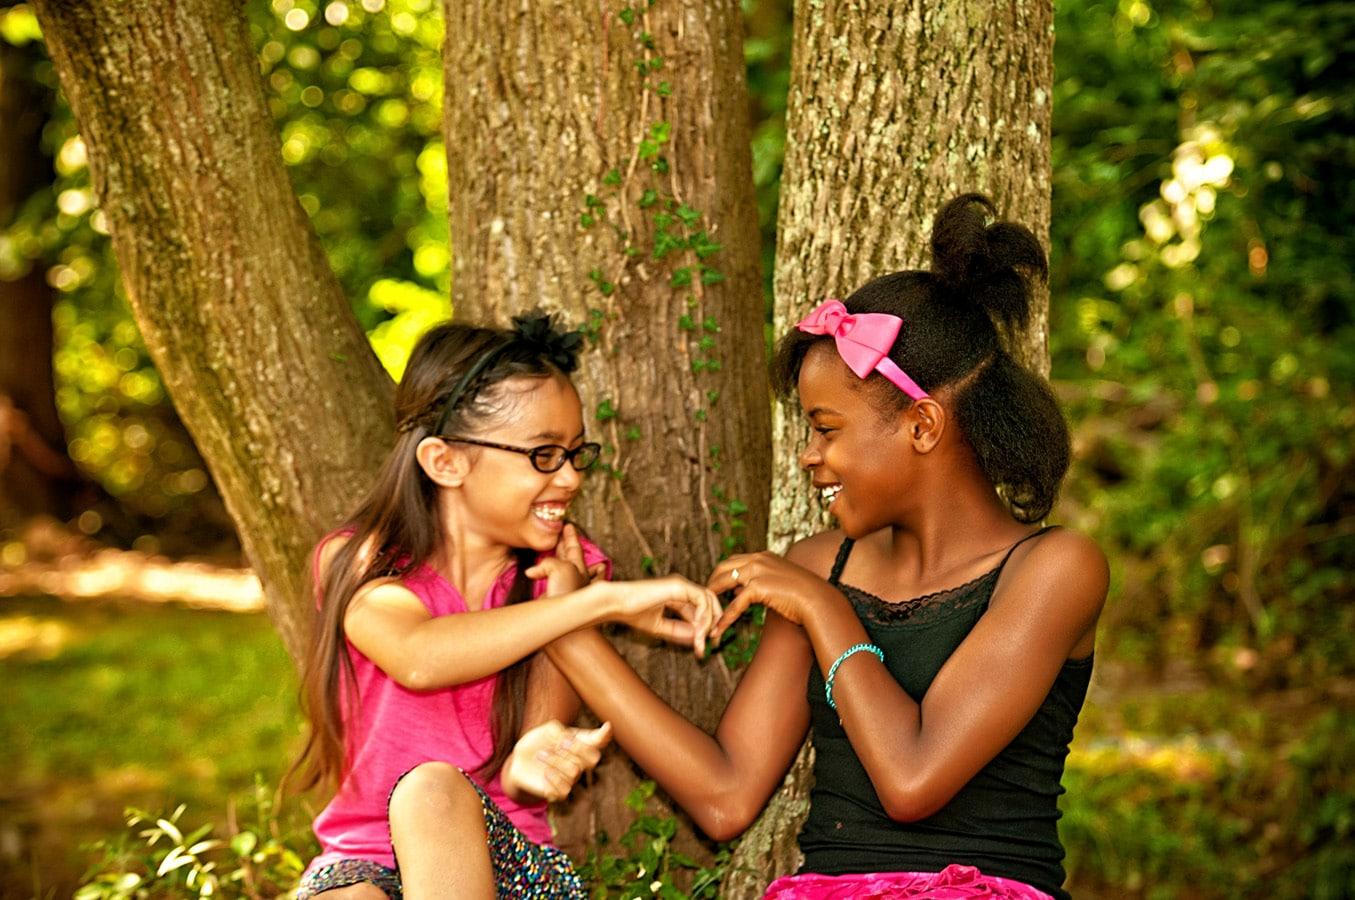 children, portrait, outdoor, trees, natural light, Northern VA